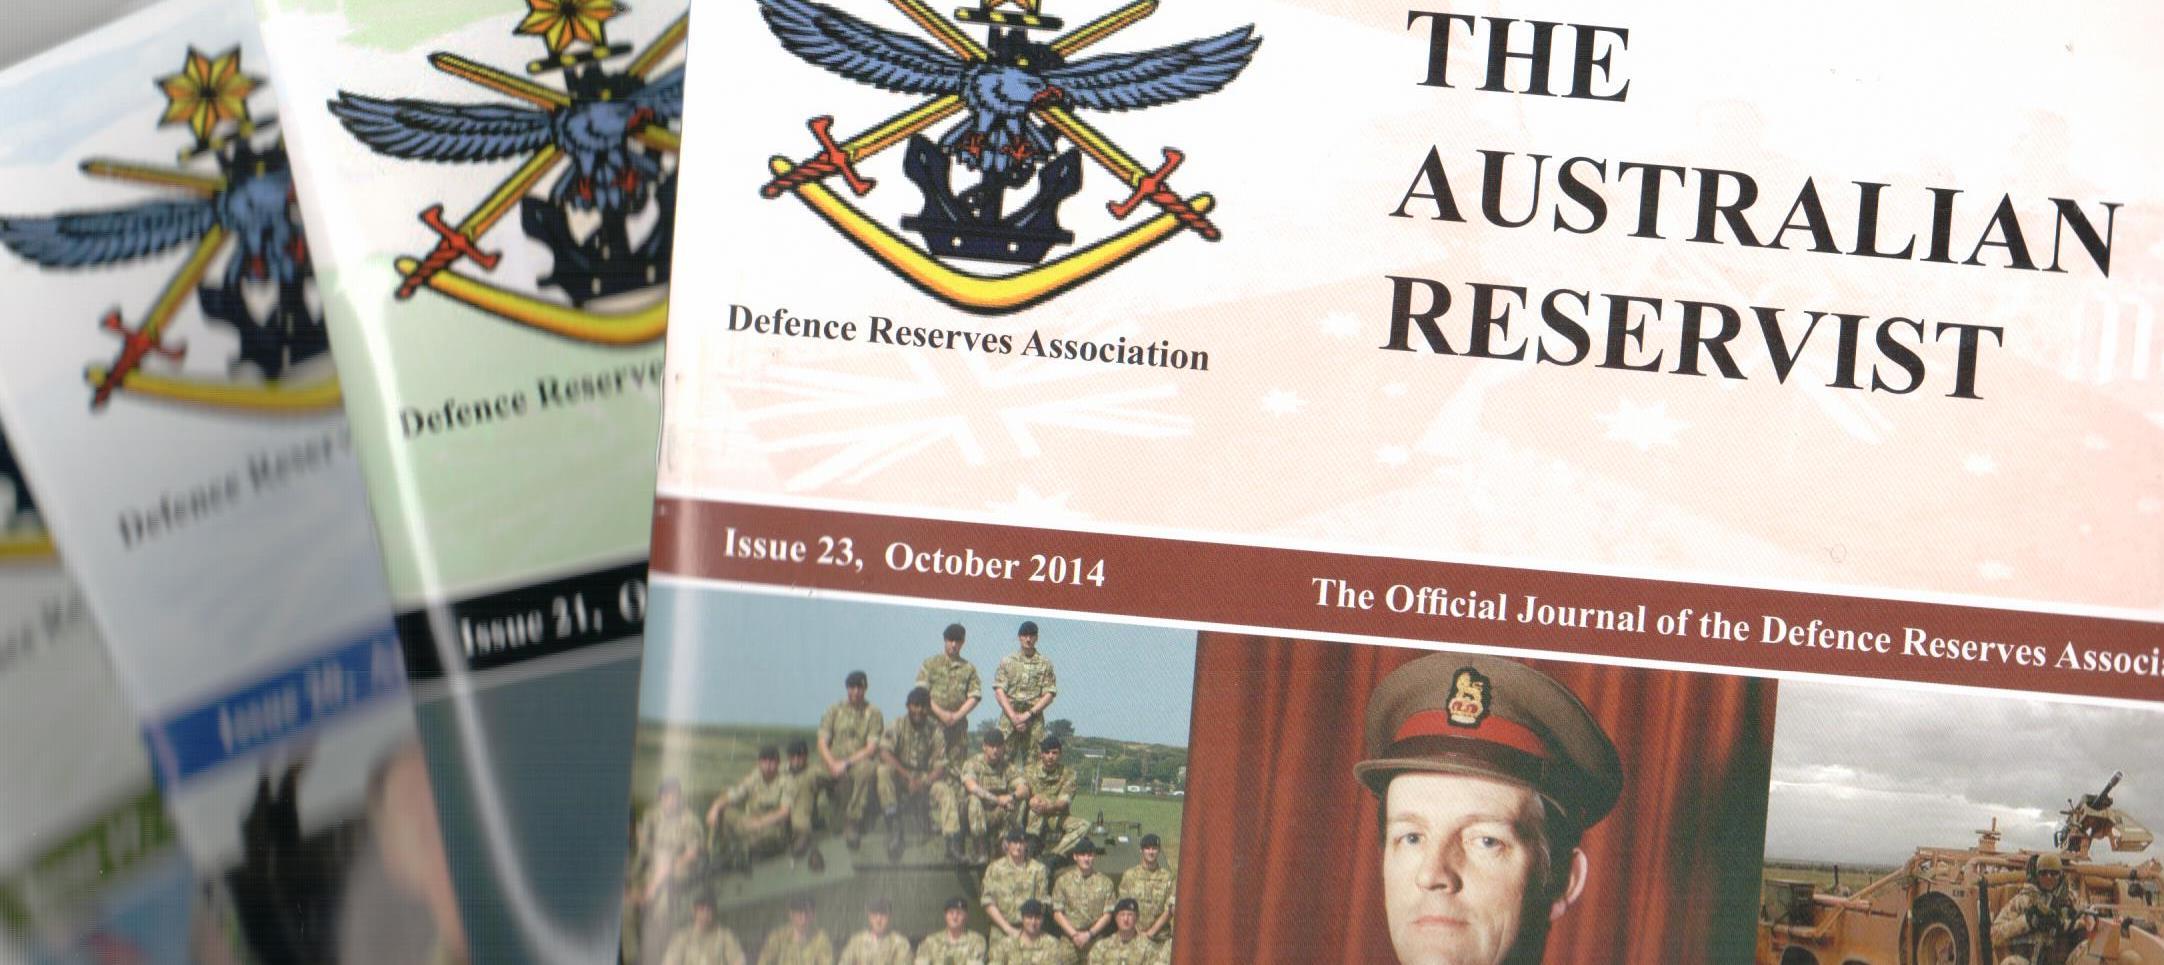 The DRA Journal - The Australian Reservist